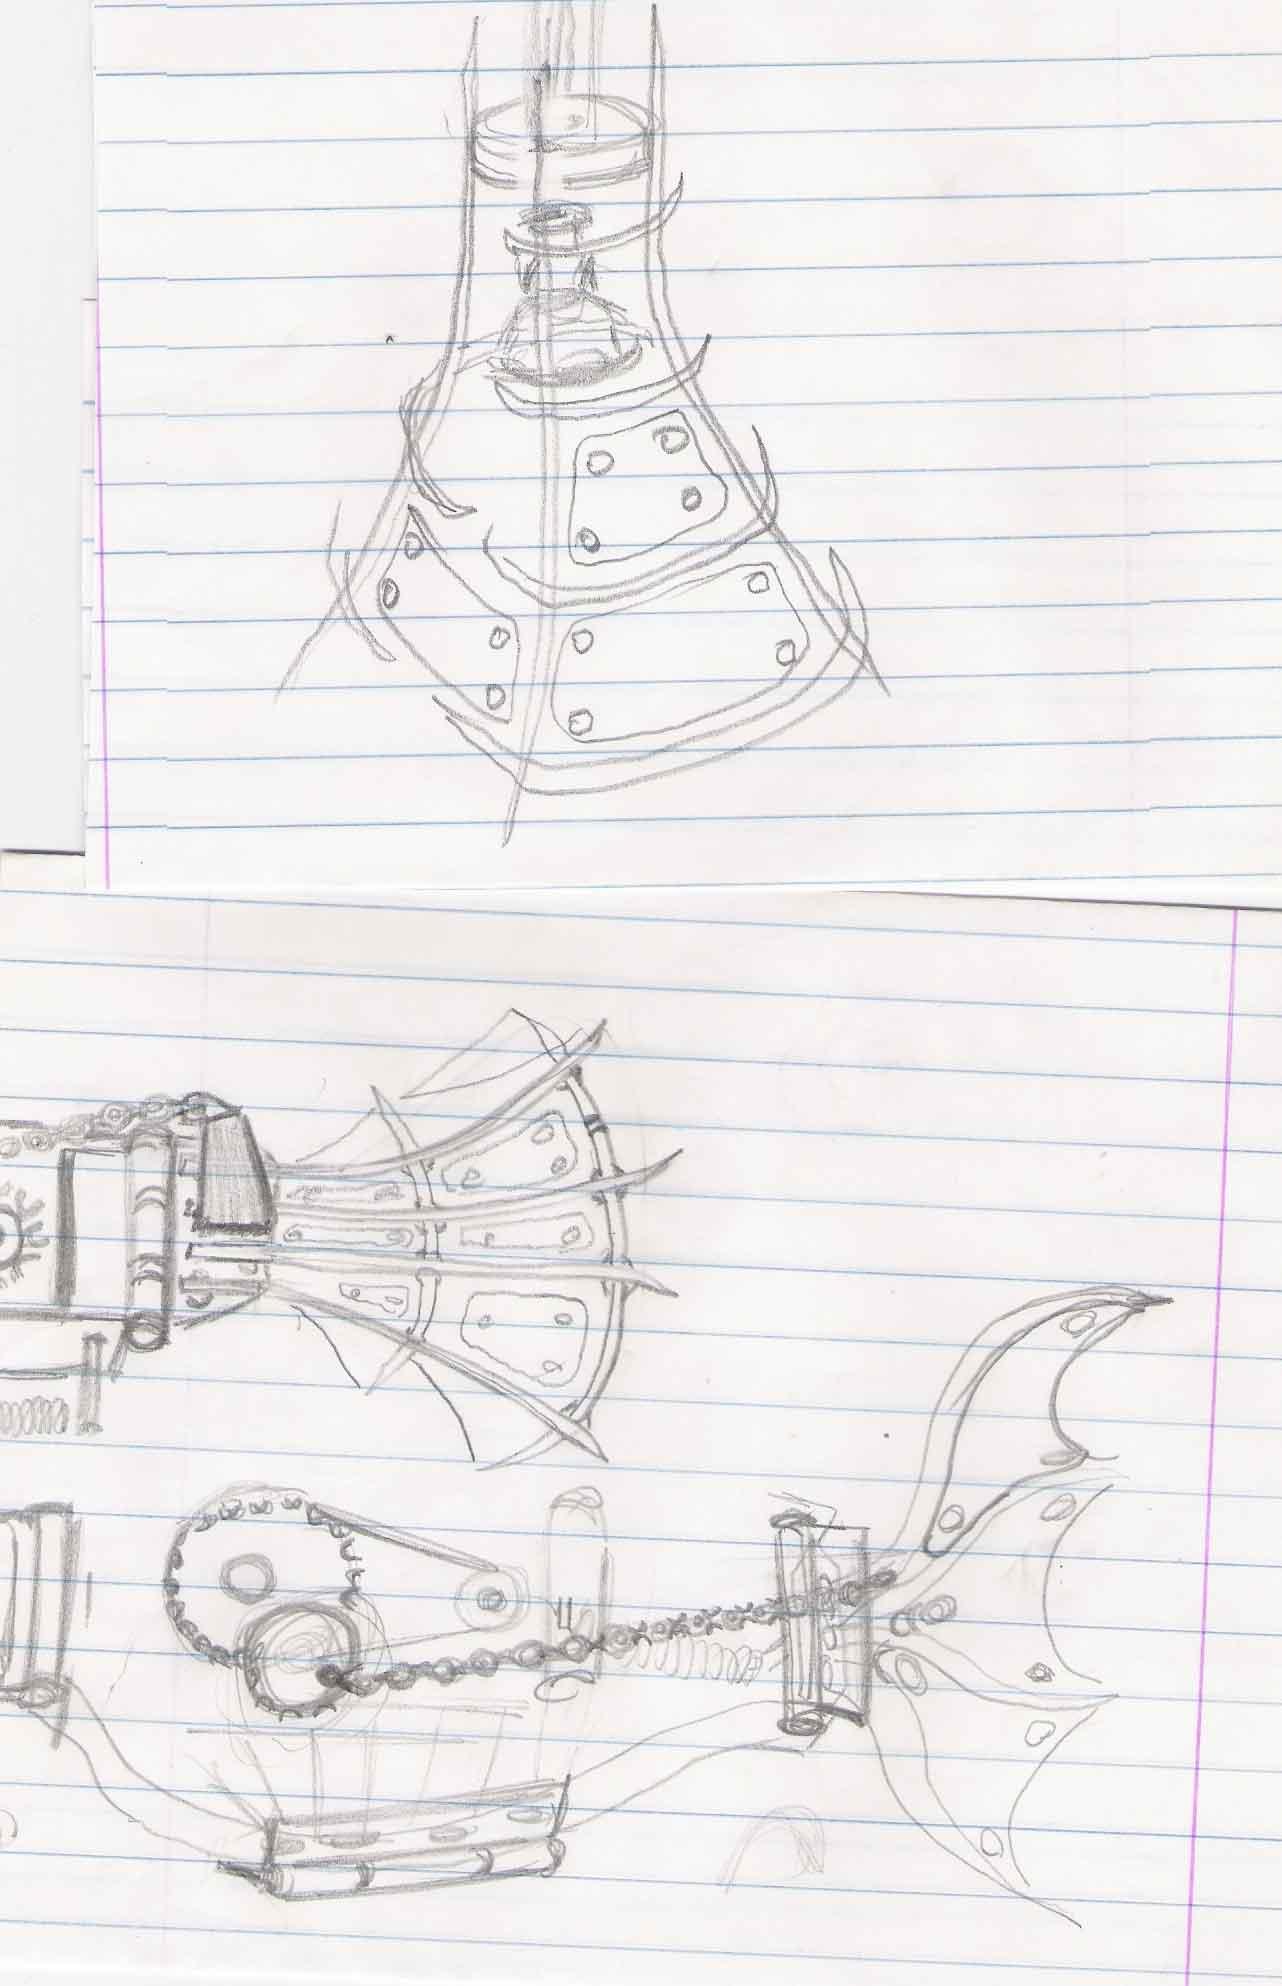 sketch-43-sept-05.jpg